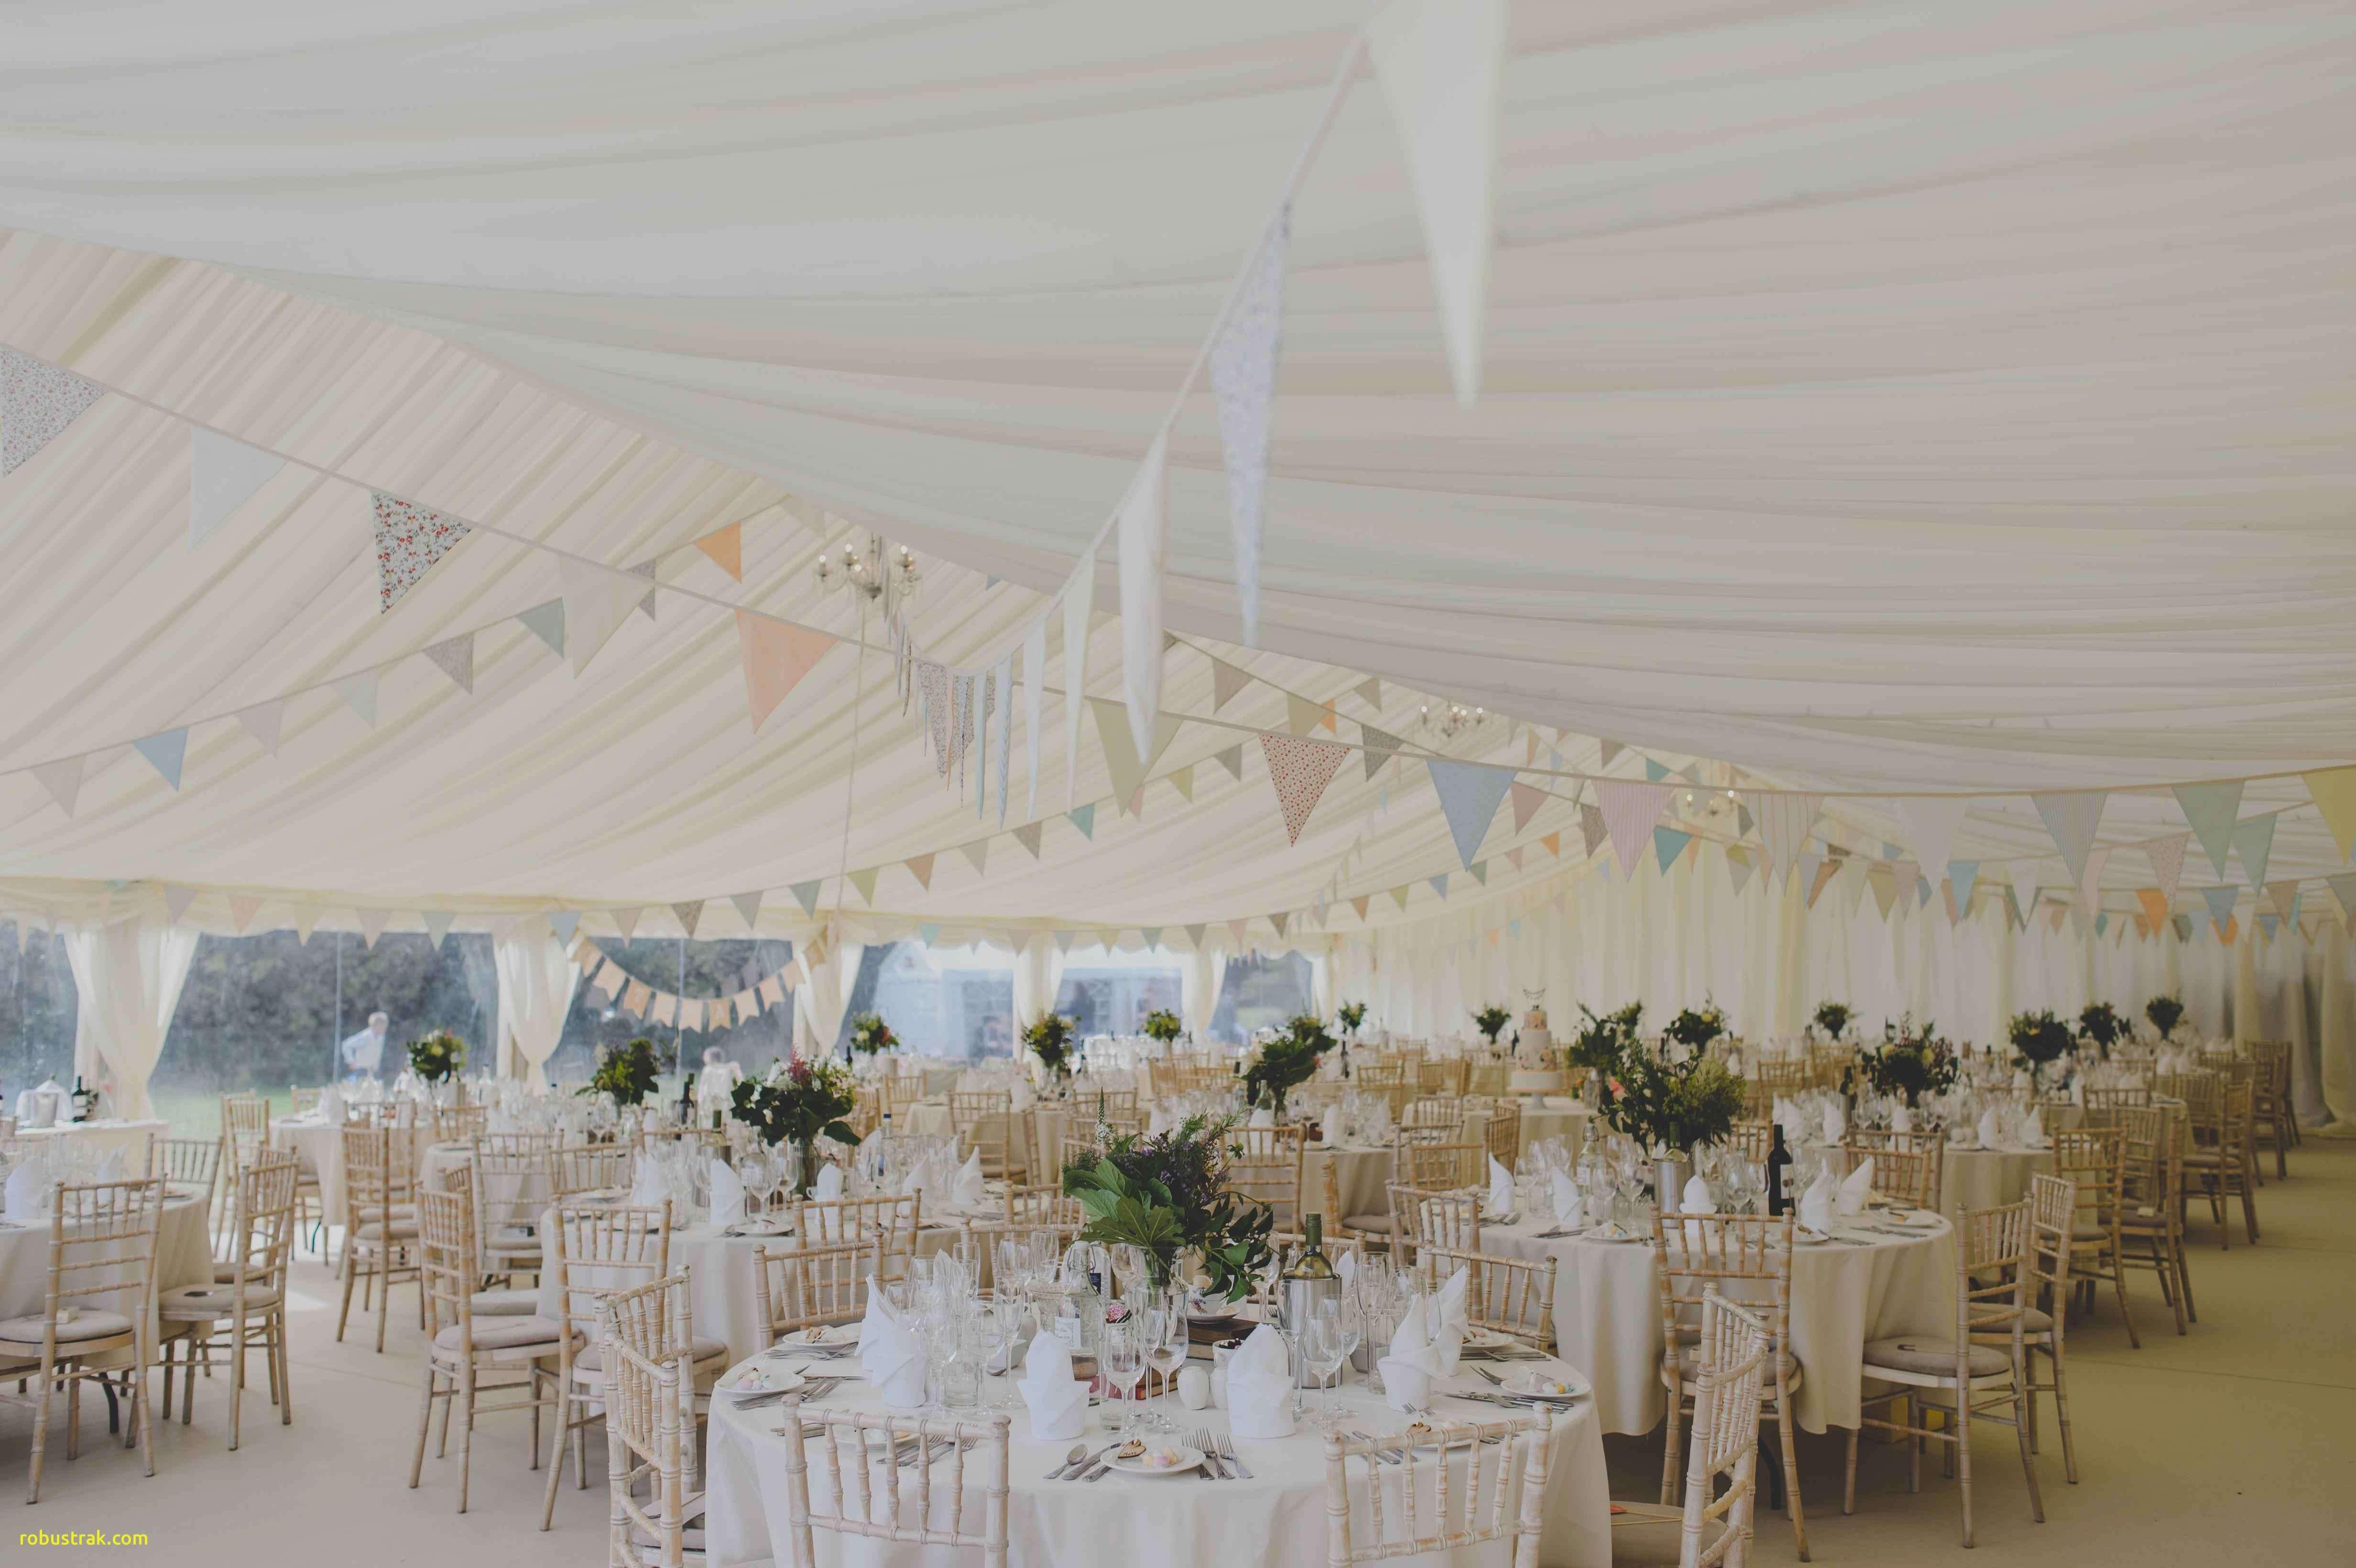 Best Of Outside Wedding Ceremony Decorations Homedecoration